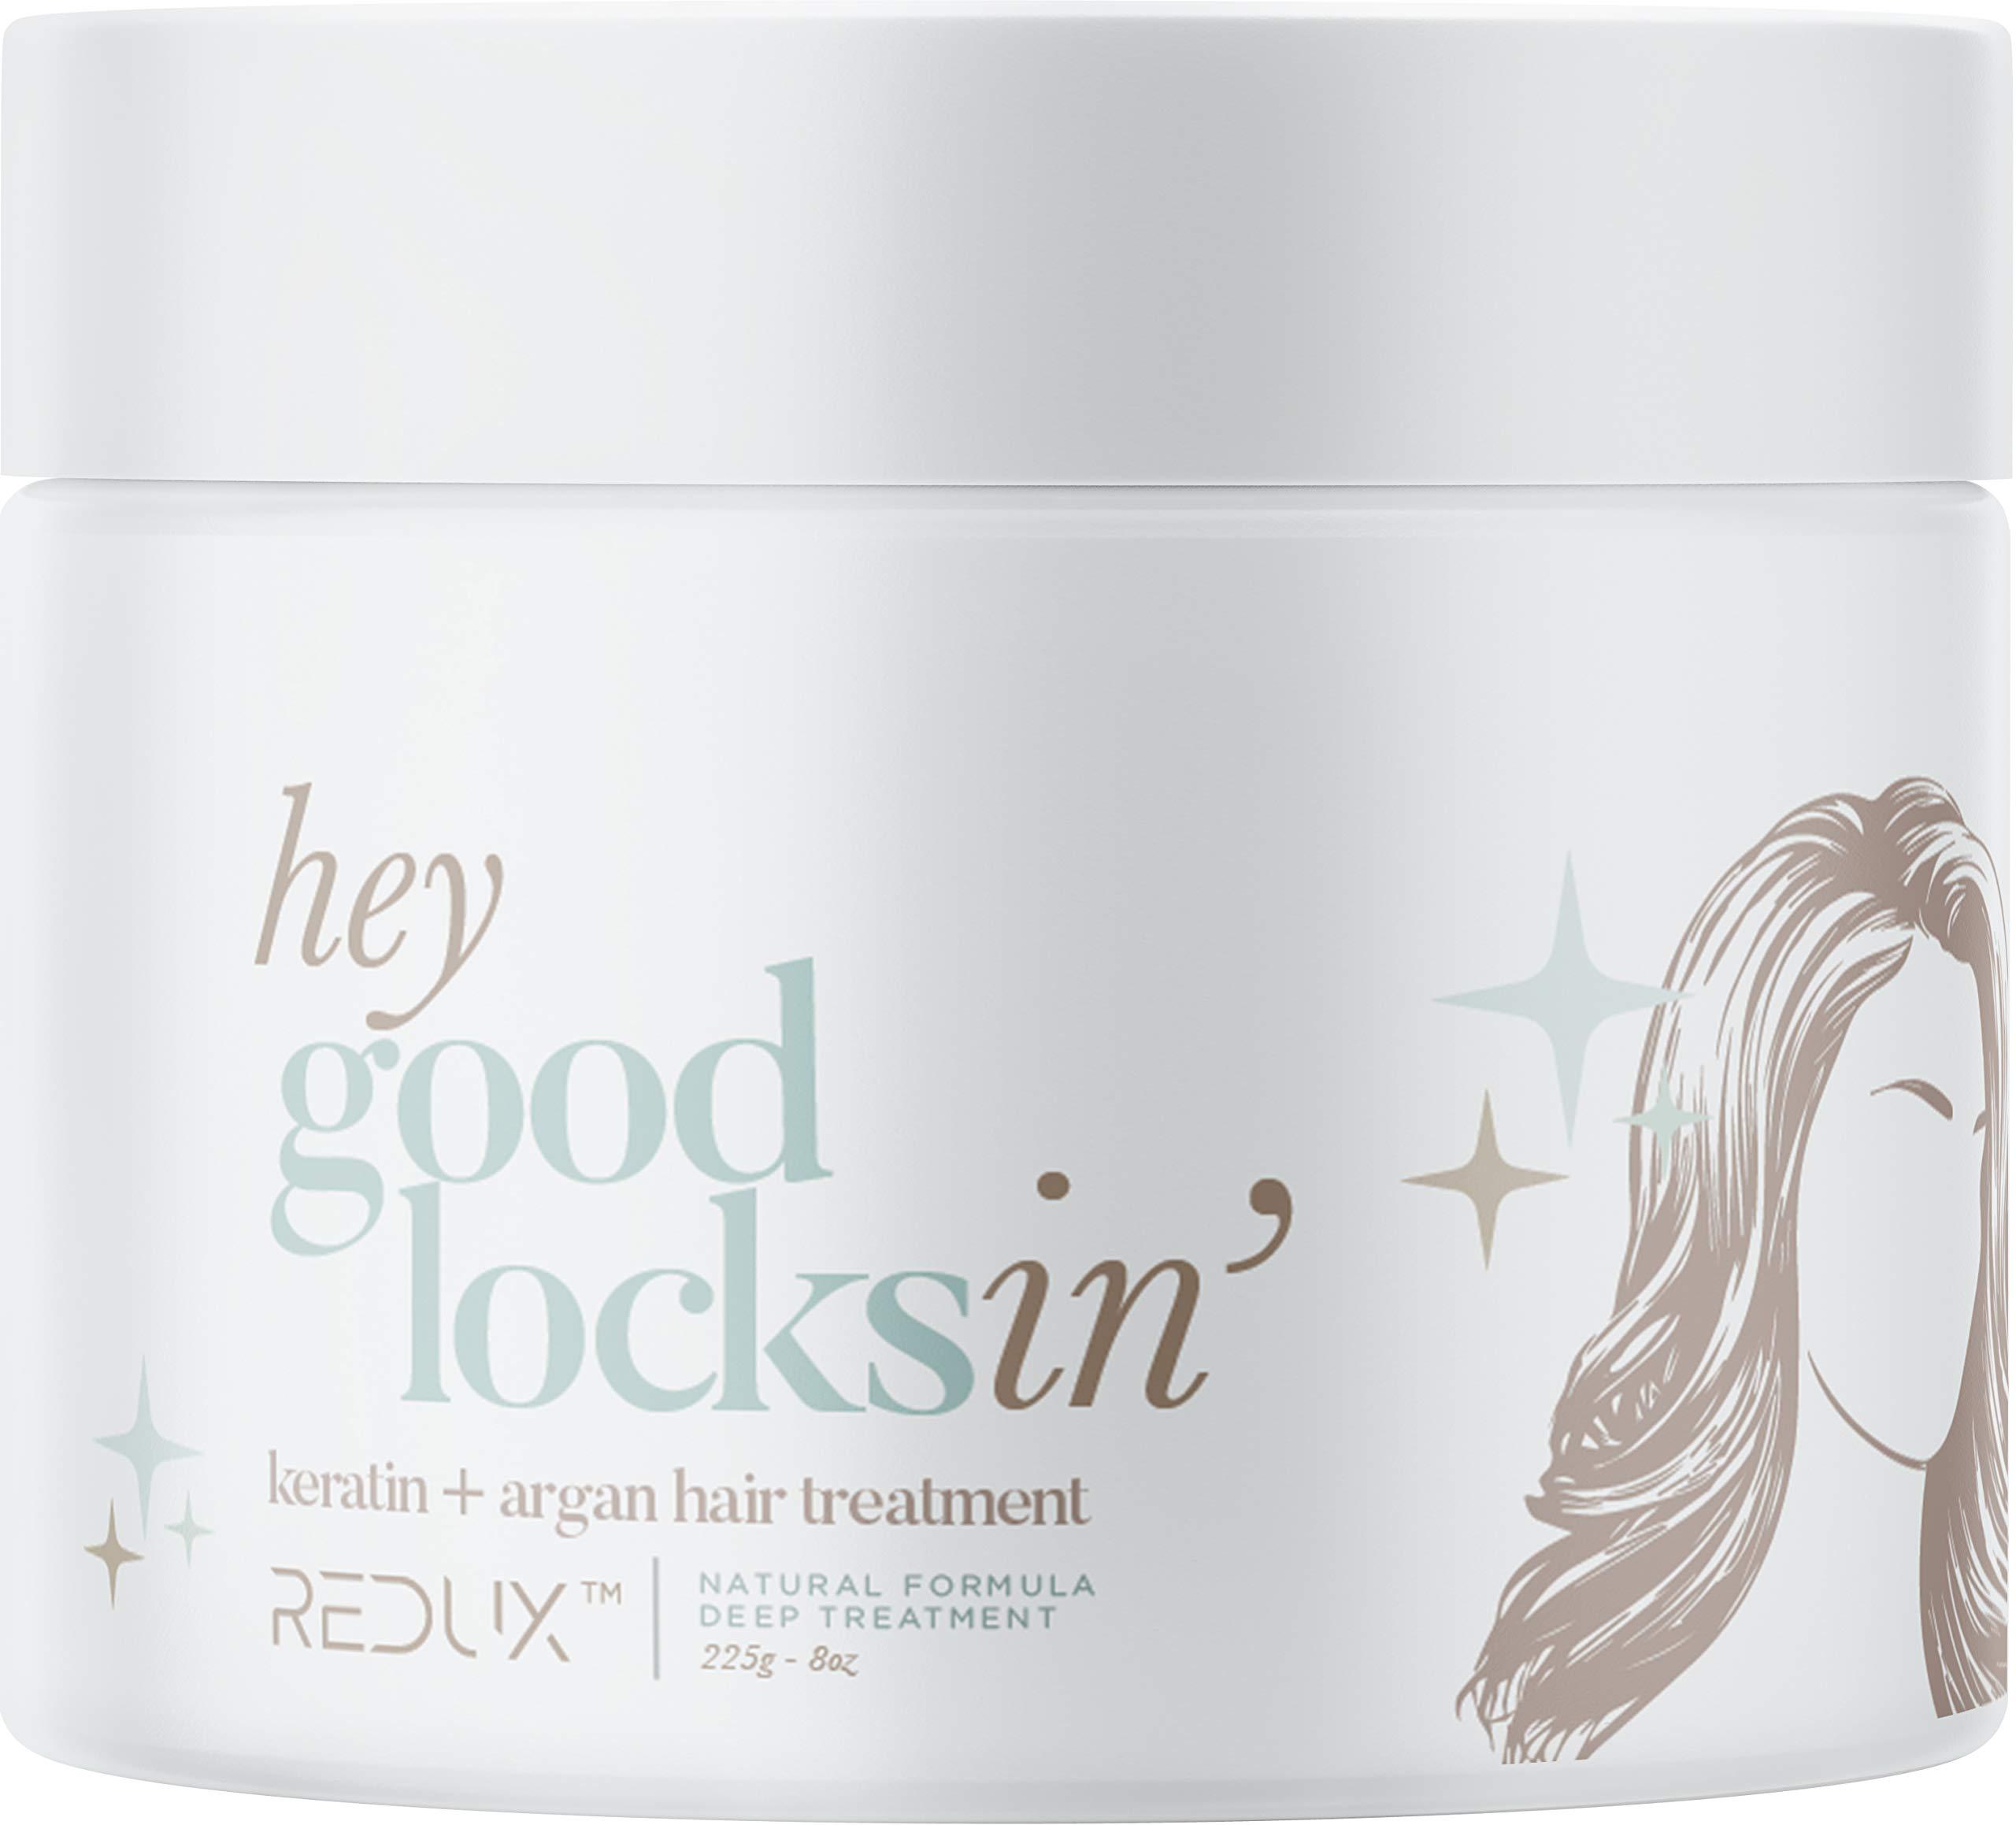 Hey Good Locksin Keratin Argan Hair Treatment - Natural Biotin 15 Minute Deep Treatment For Dull, Dry, Damaged Hair Repair, Nourishment 8oz